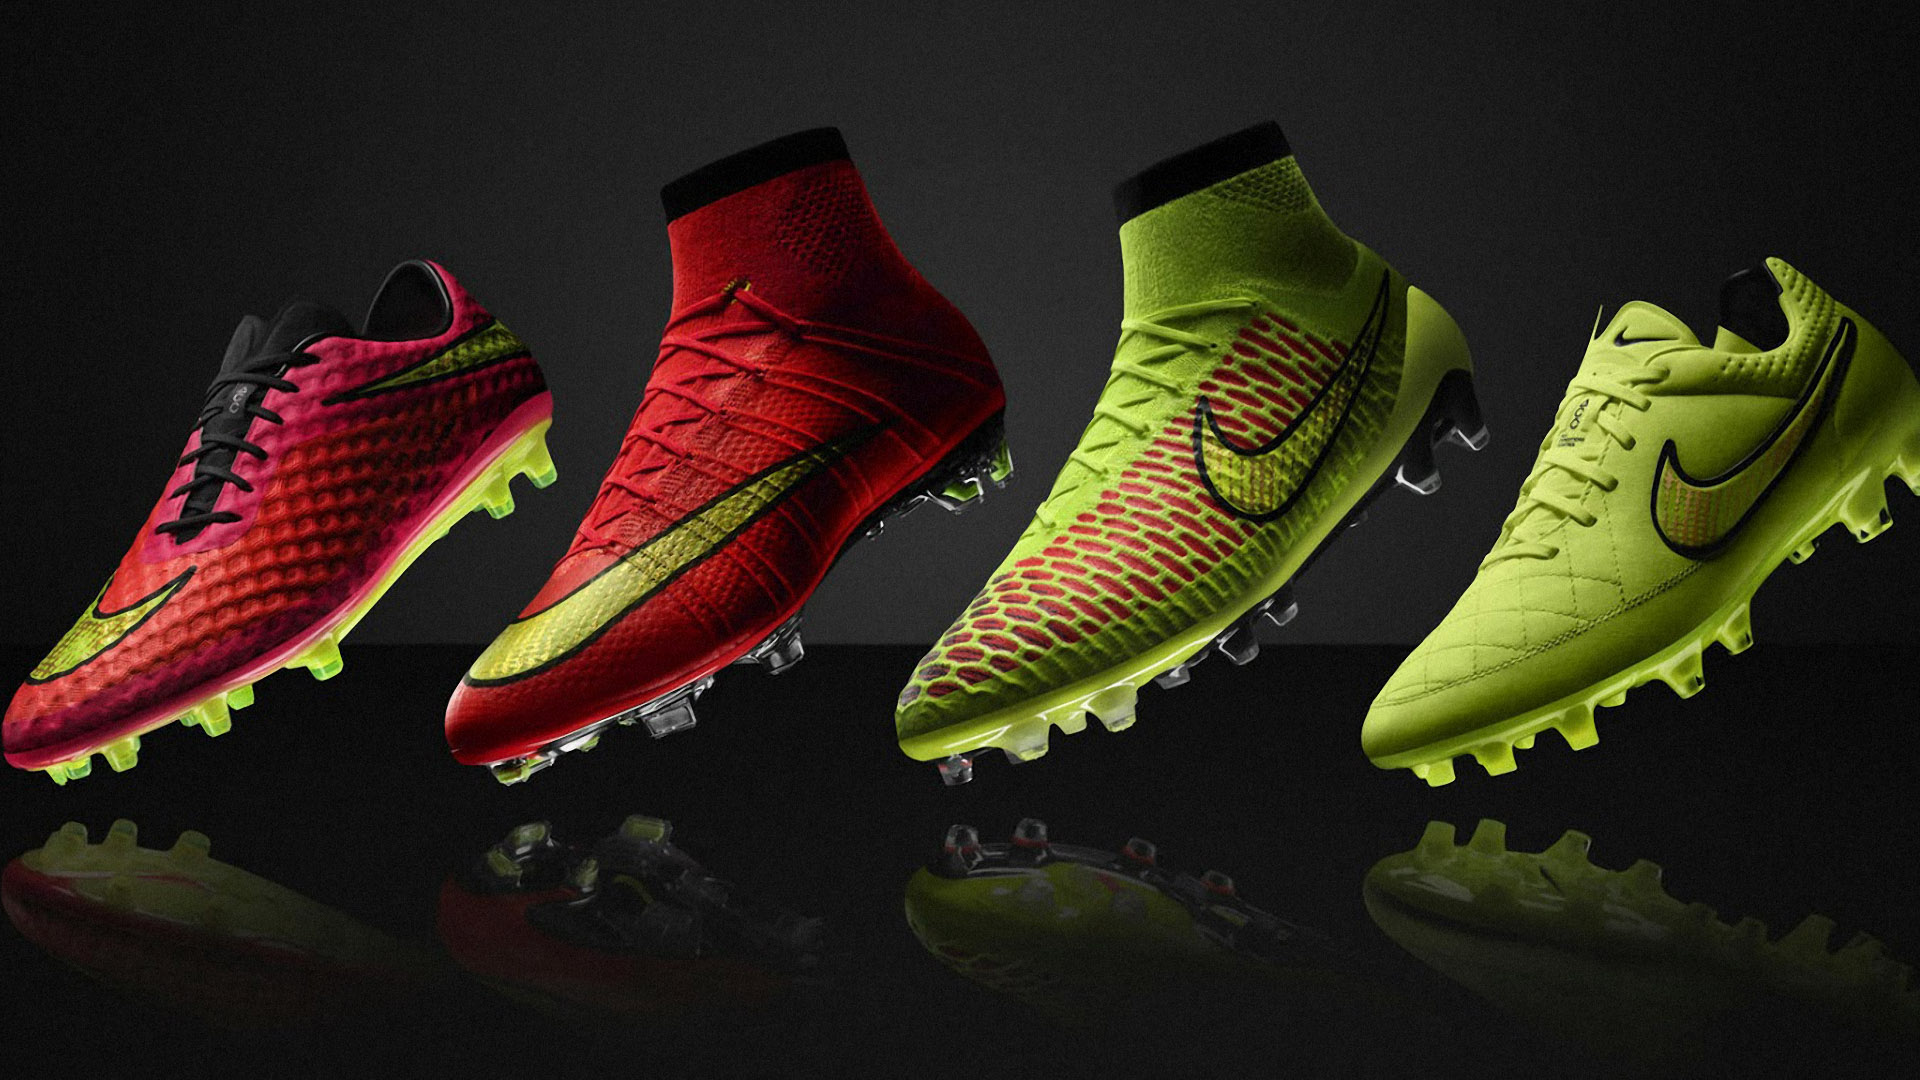 Nike Football Wallpapers 2015